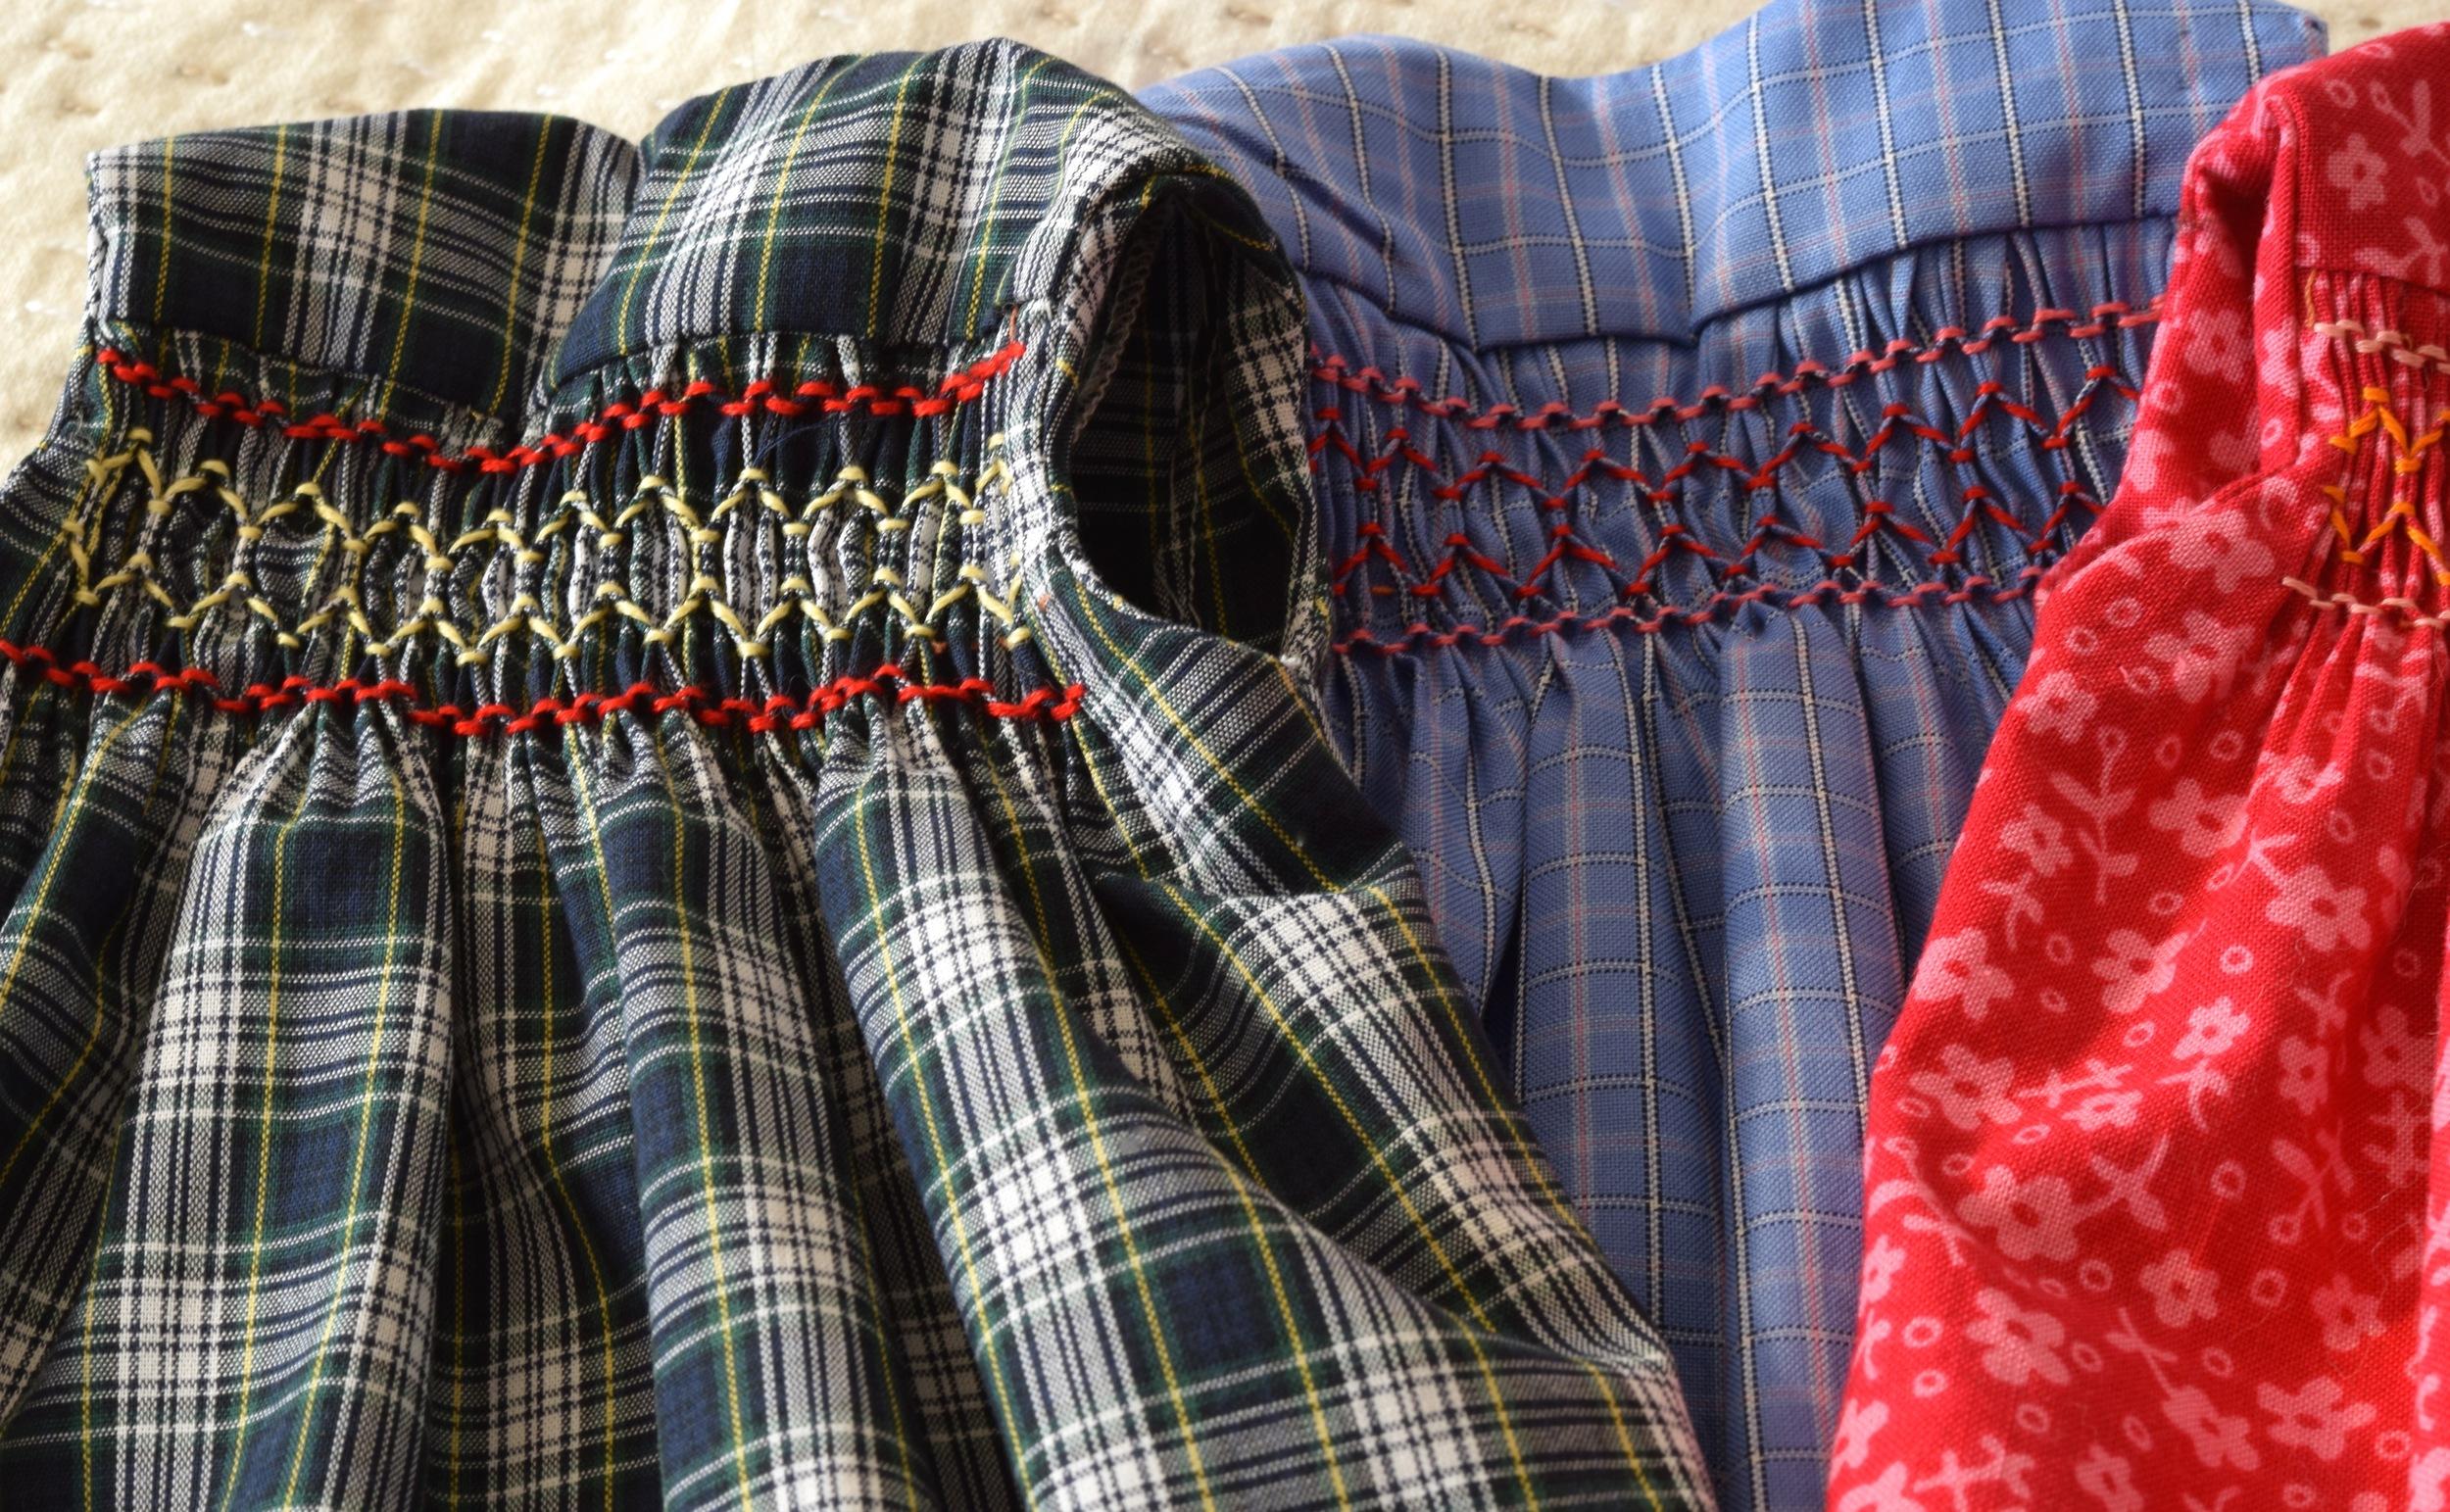 Smocked doll dresses